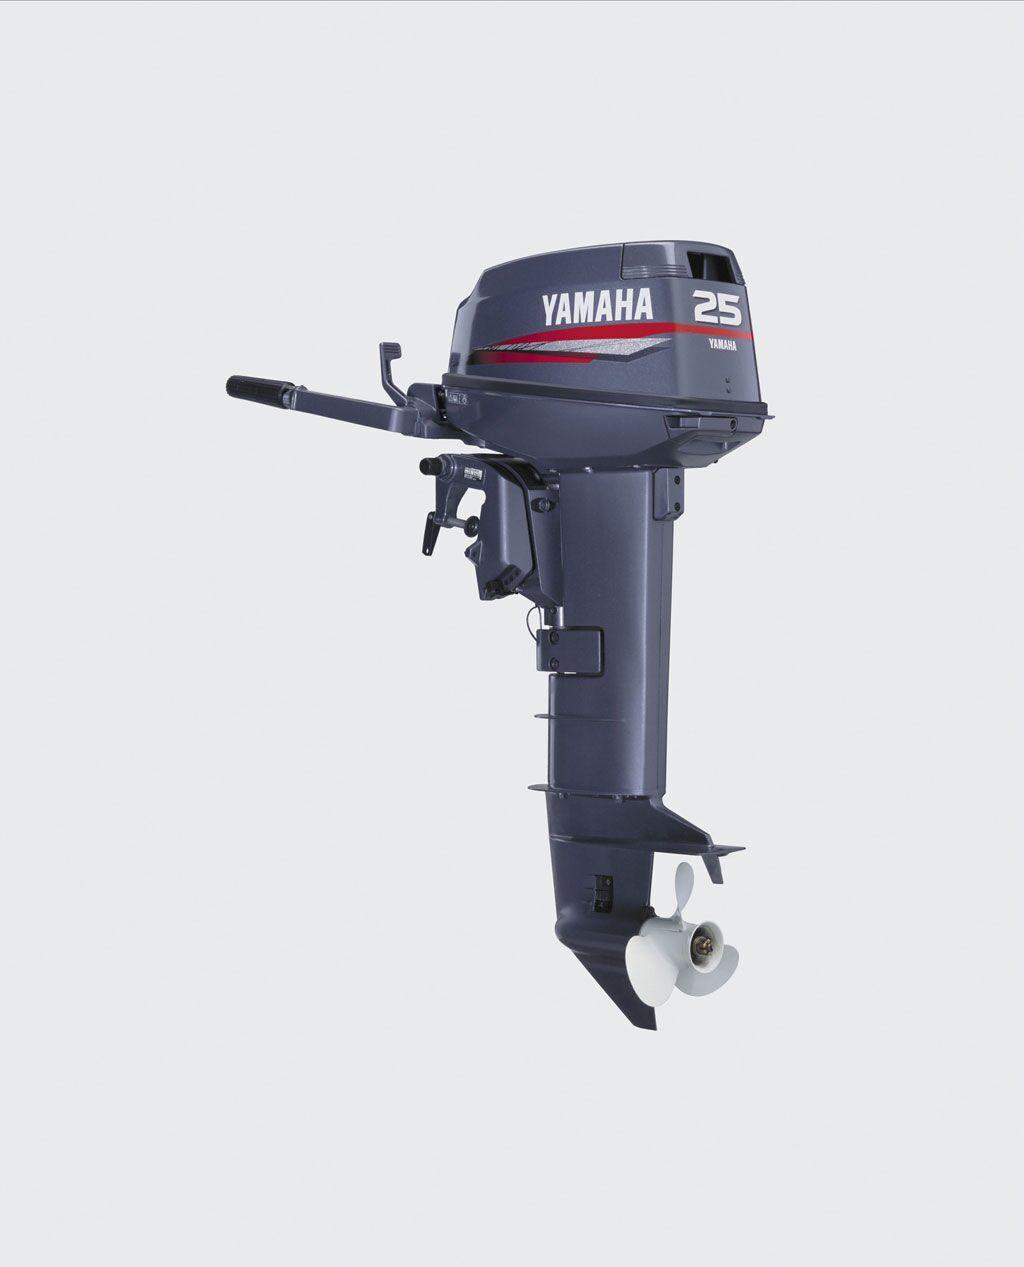 характеристика подвесных лодочных моторов ямаха